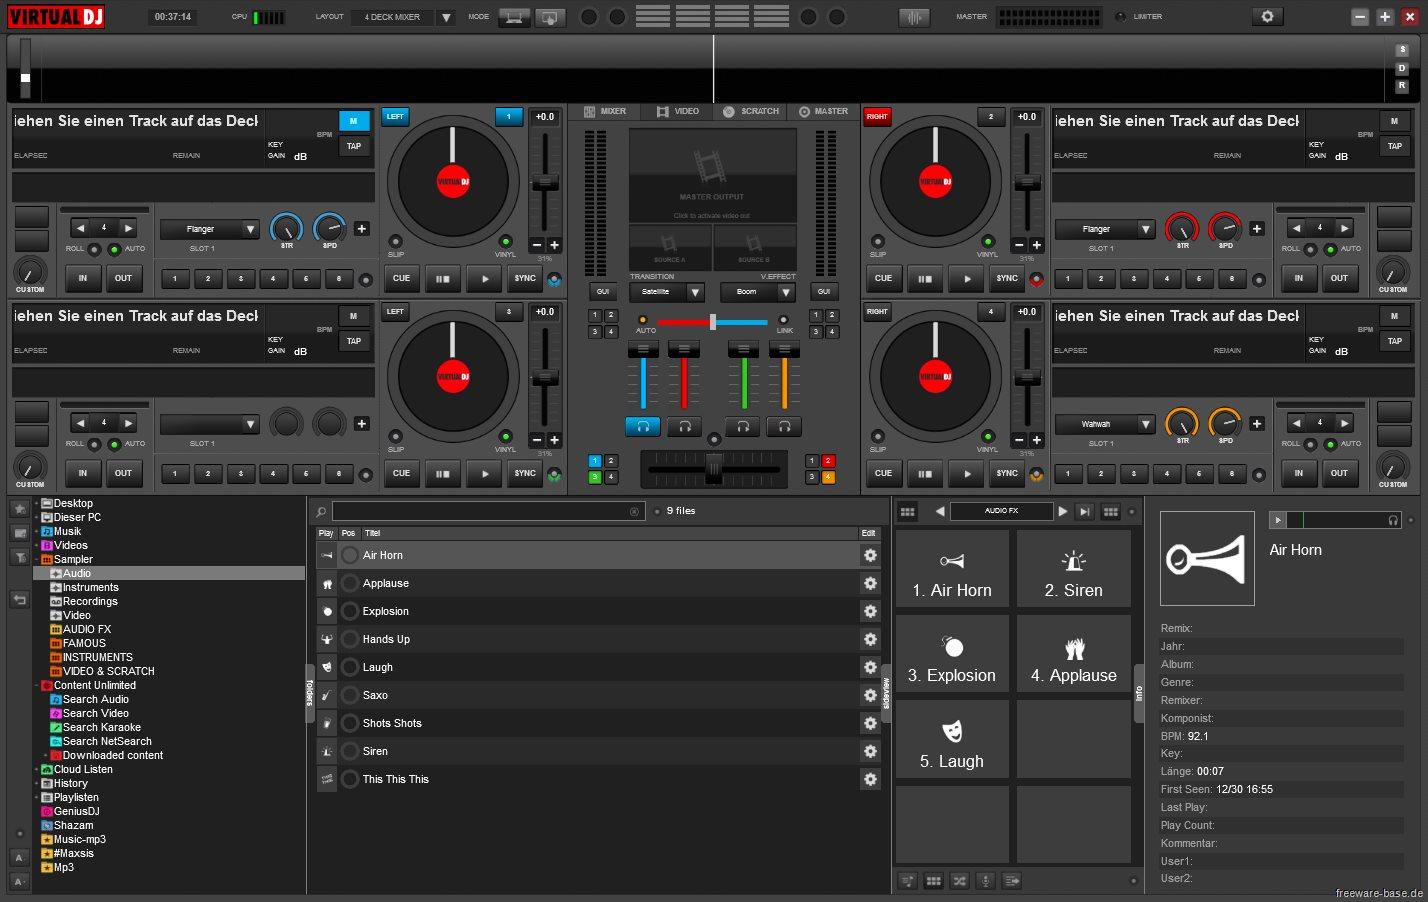 Vorschau Virtual DJ Home - Bild 2